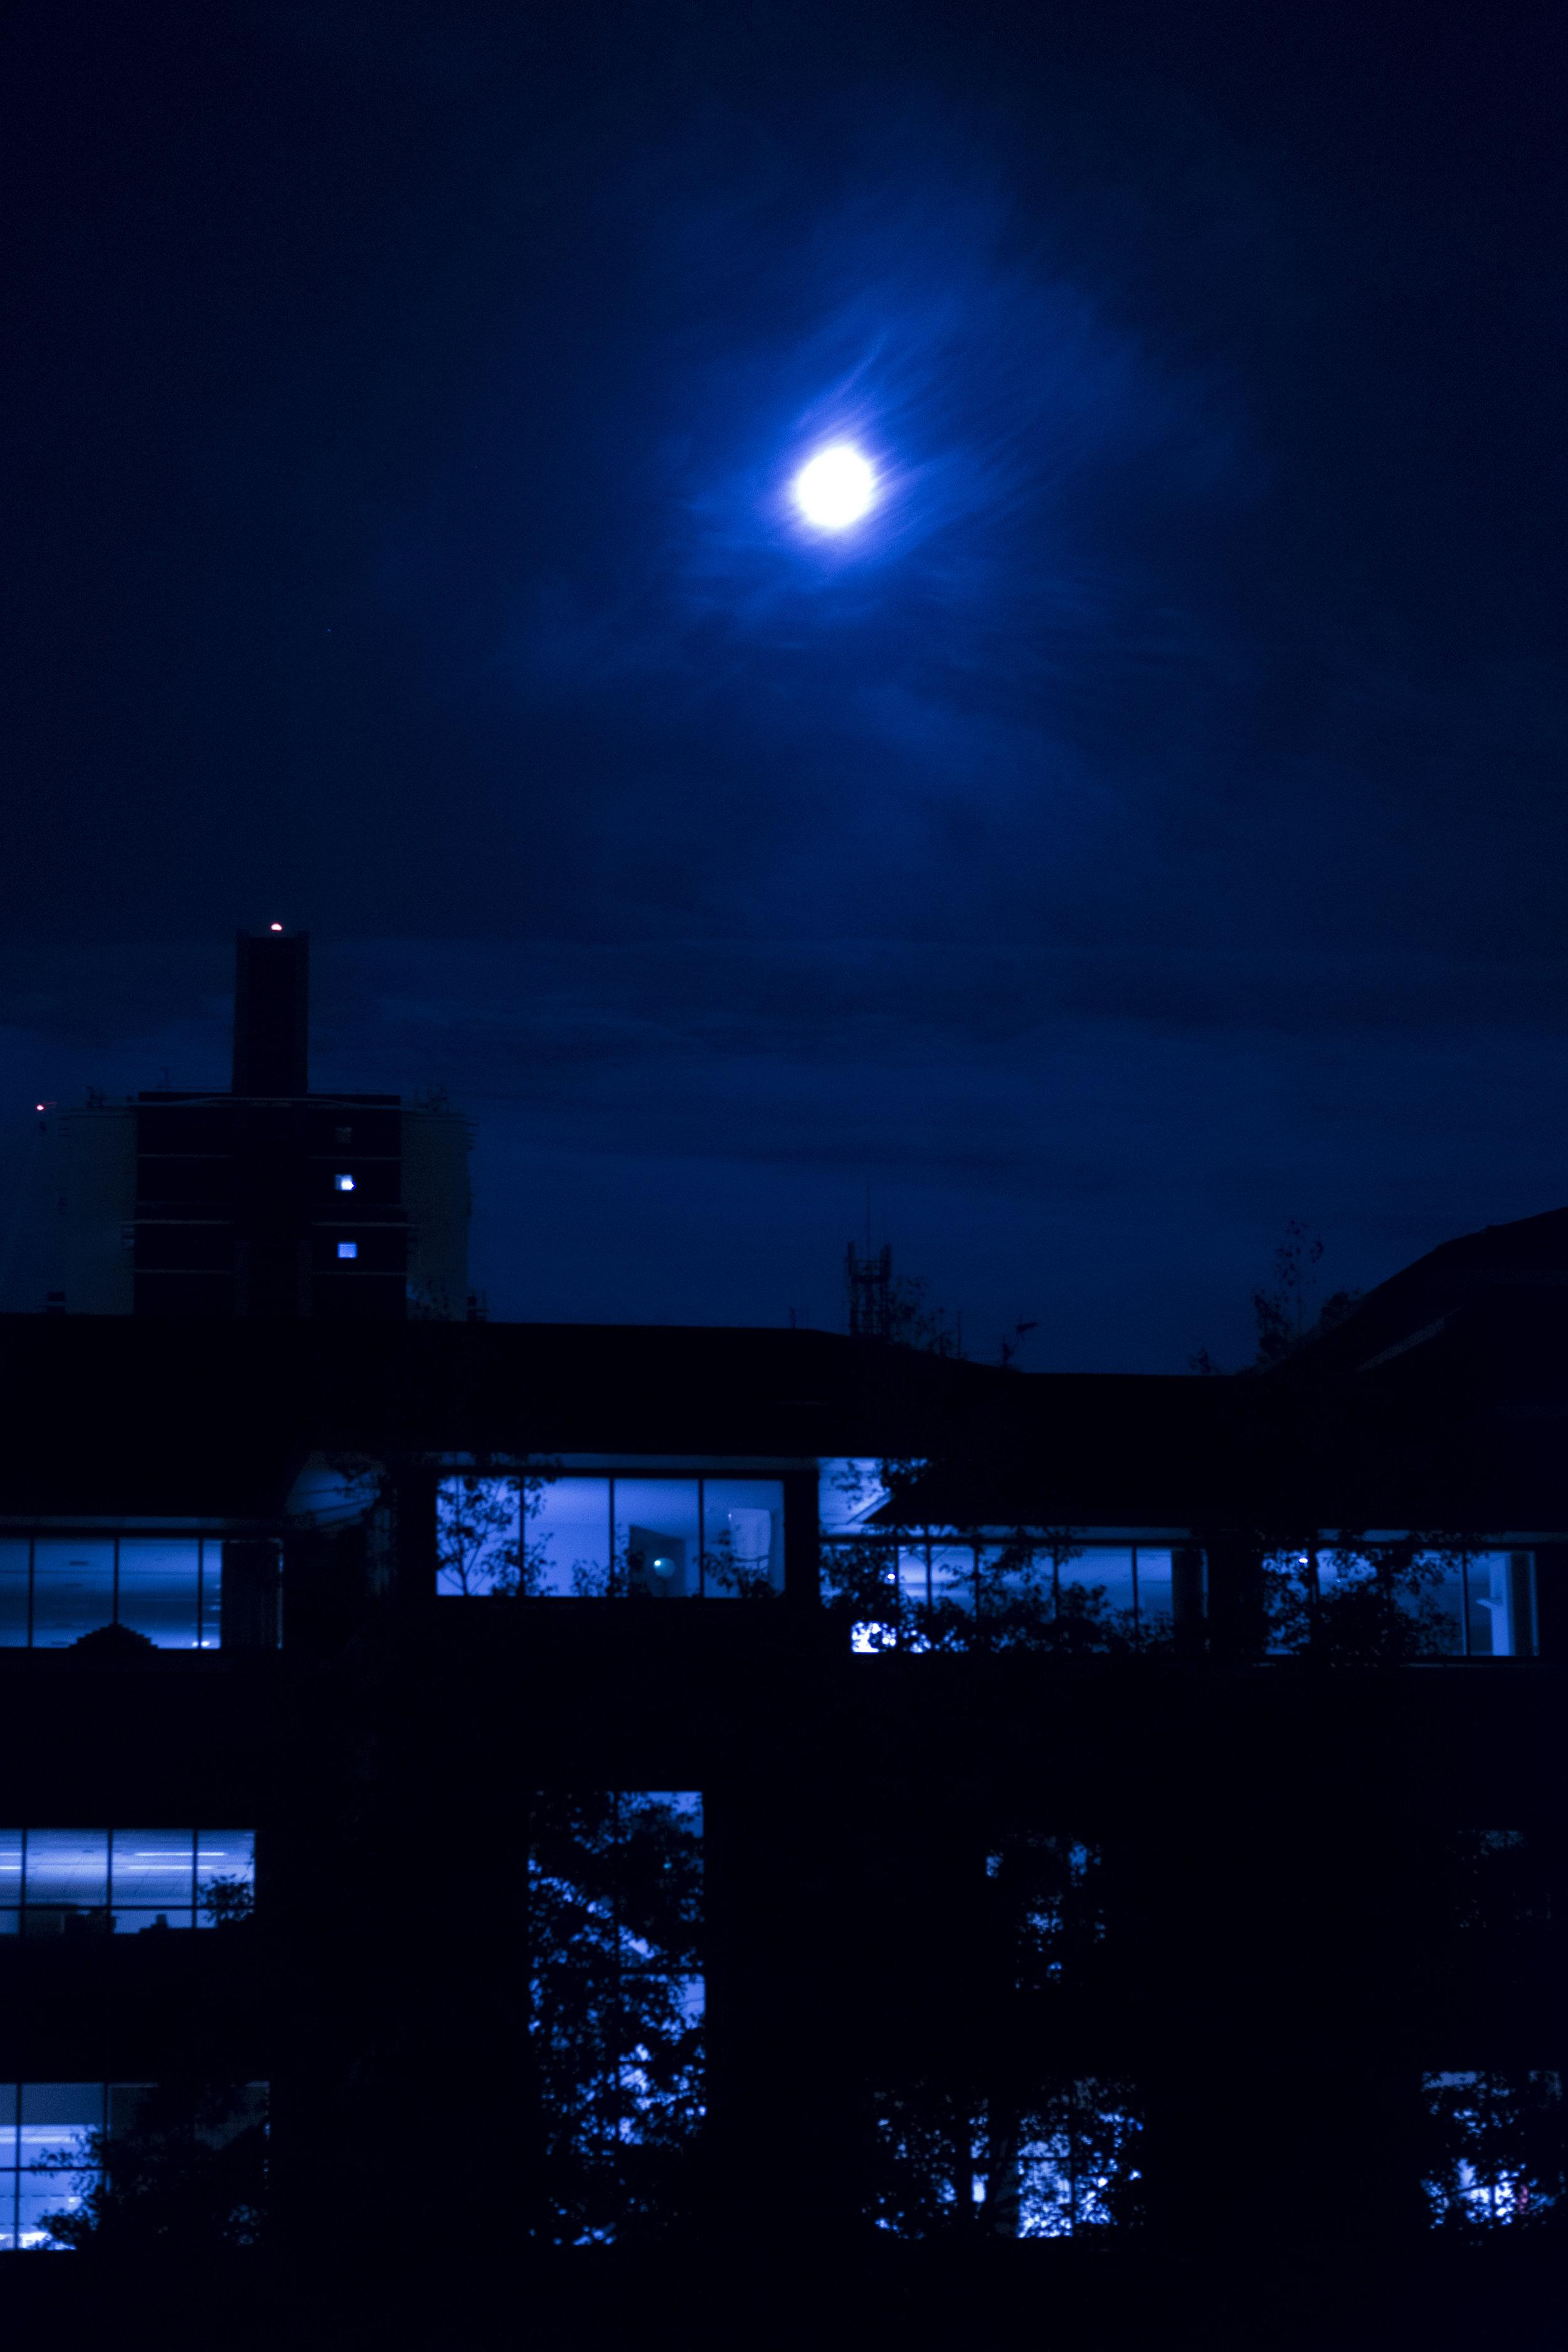 moon_blue.jpg